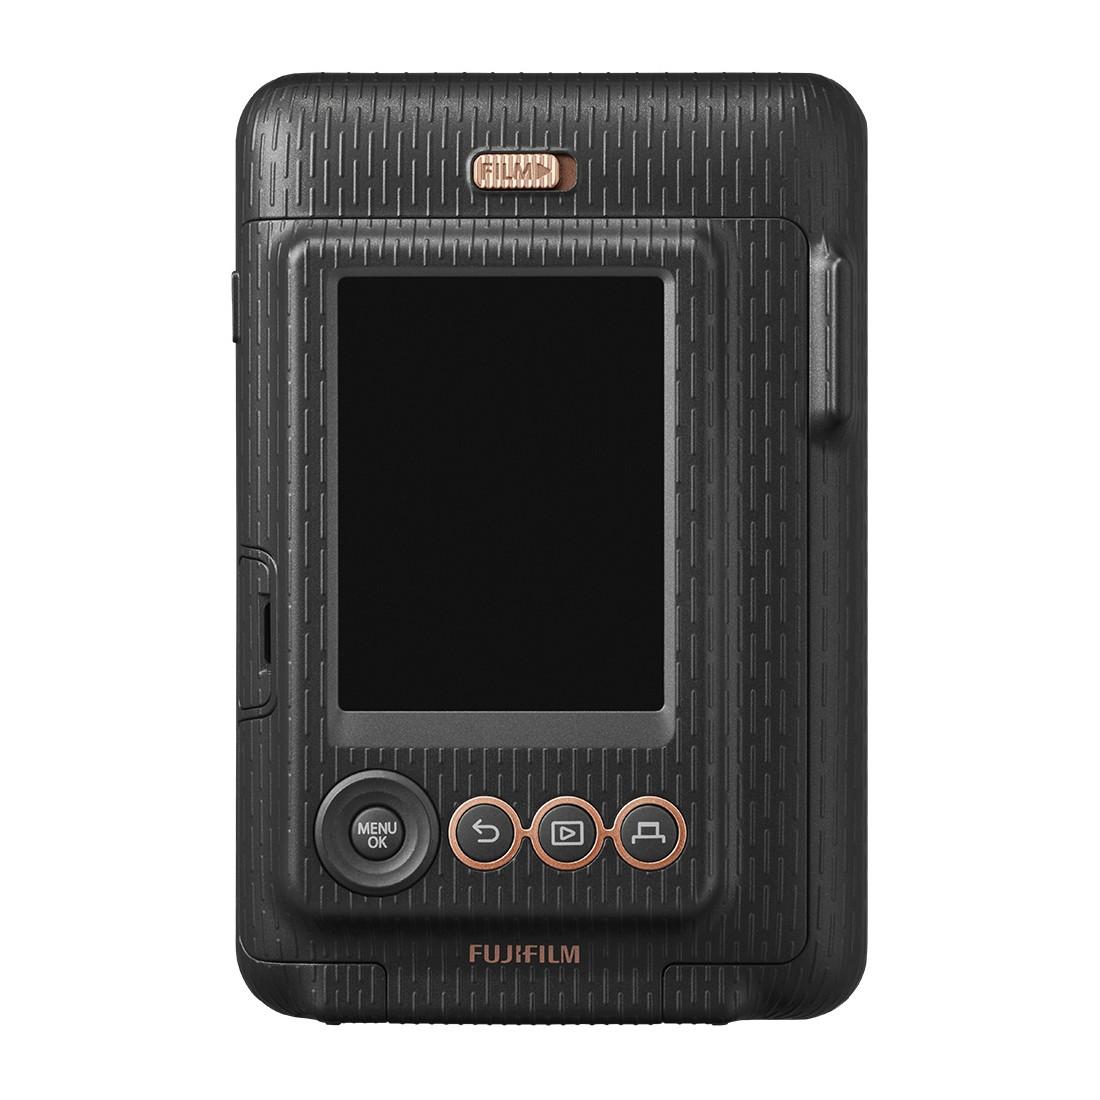 Cámara Fujifilm Instax Mini LiPlay Elegant + correa + funda, color Negro